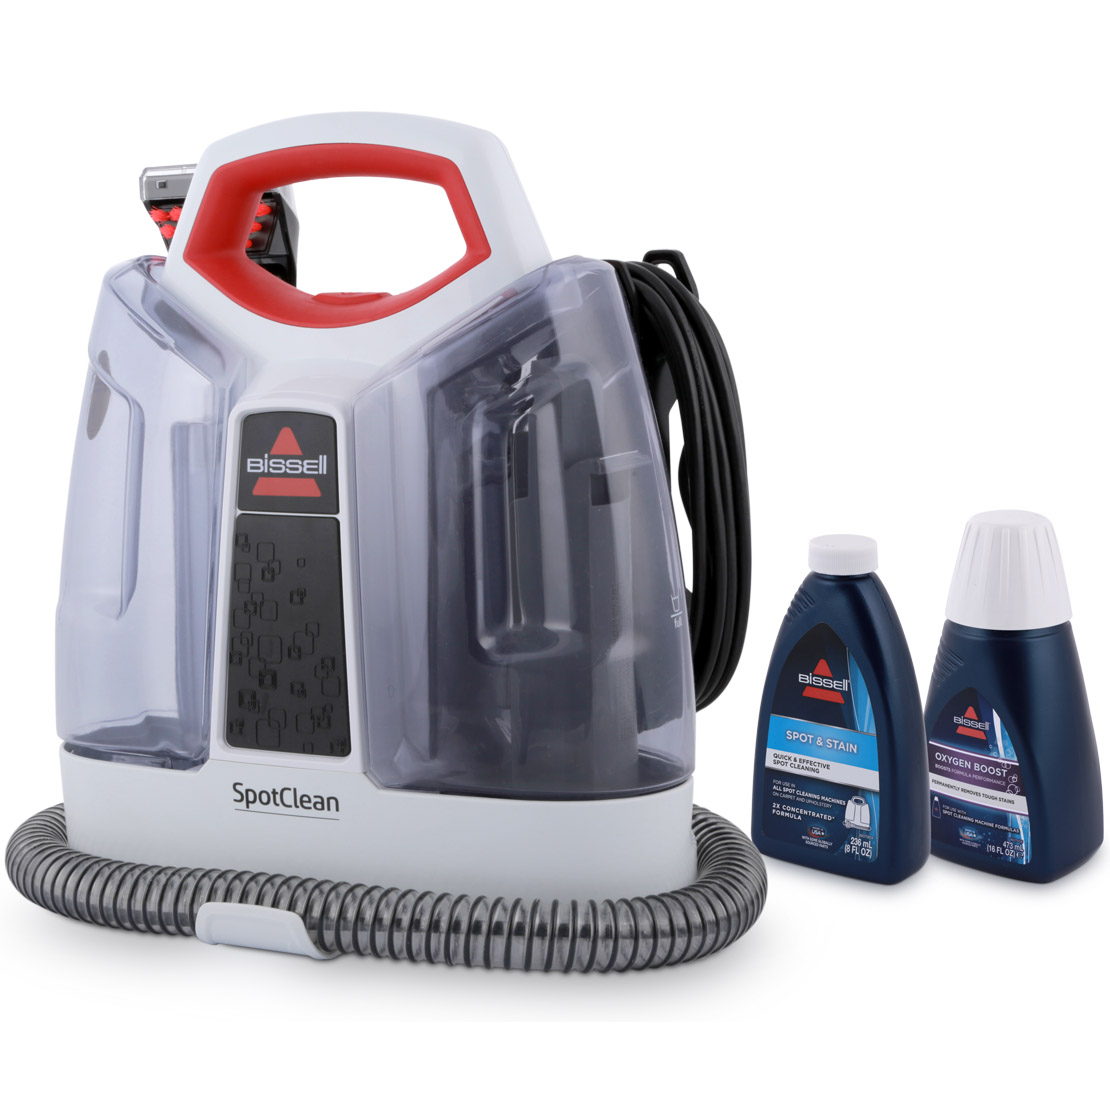 SpotClean Portable Carpet Cleaner 3698E